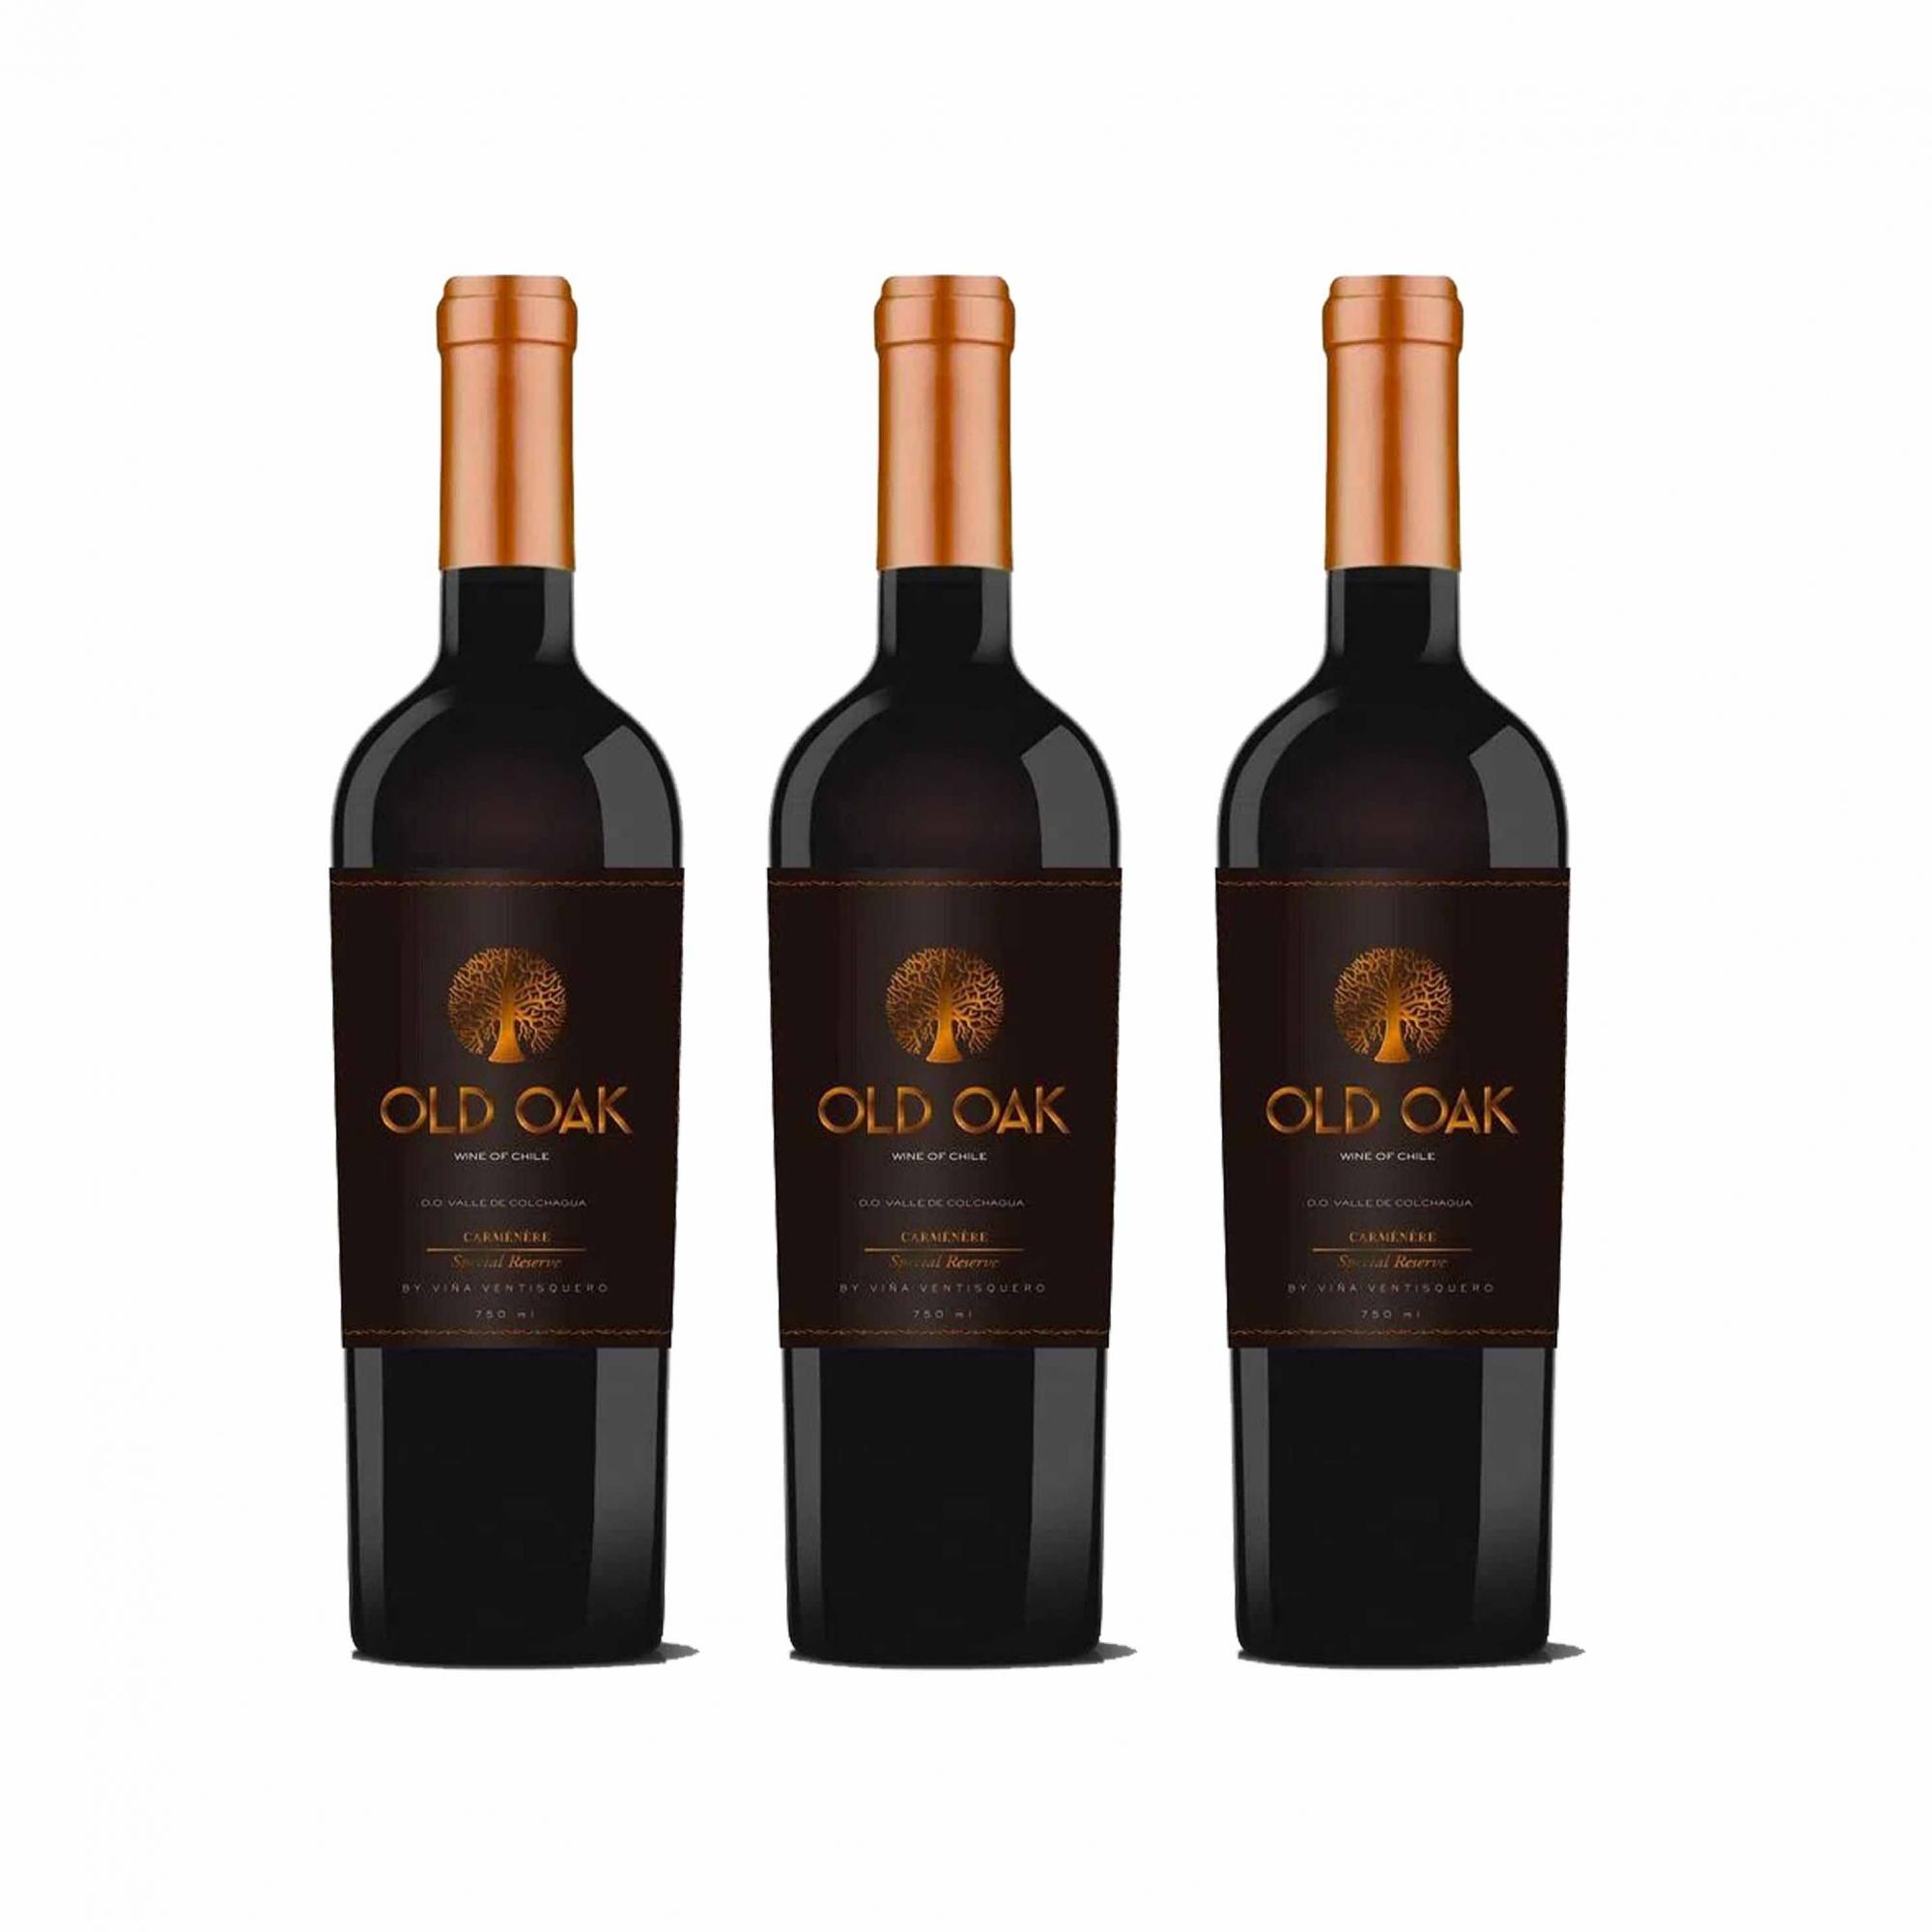 Kit 3x Vinho Tinto Chileno Old Oak Special Reserve Carmenere 2018